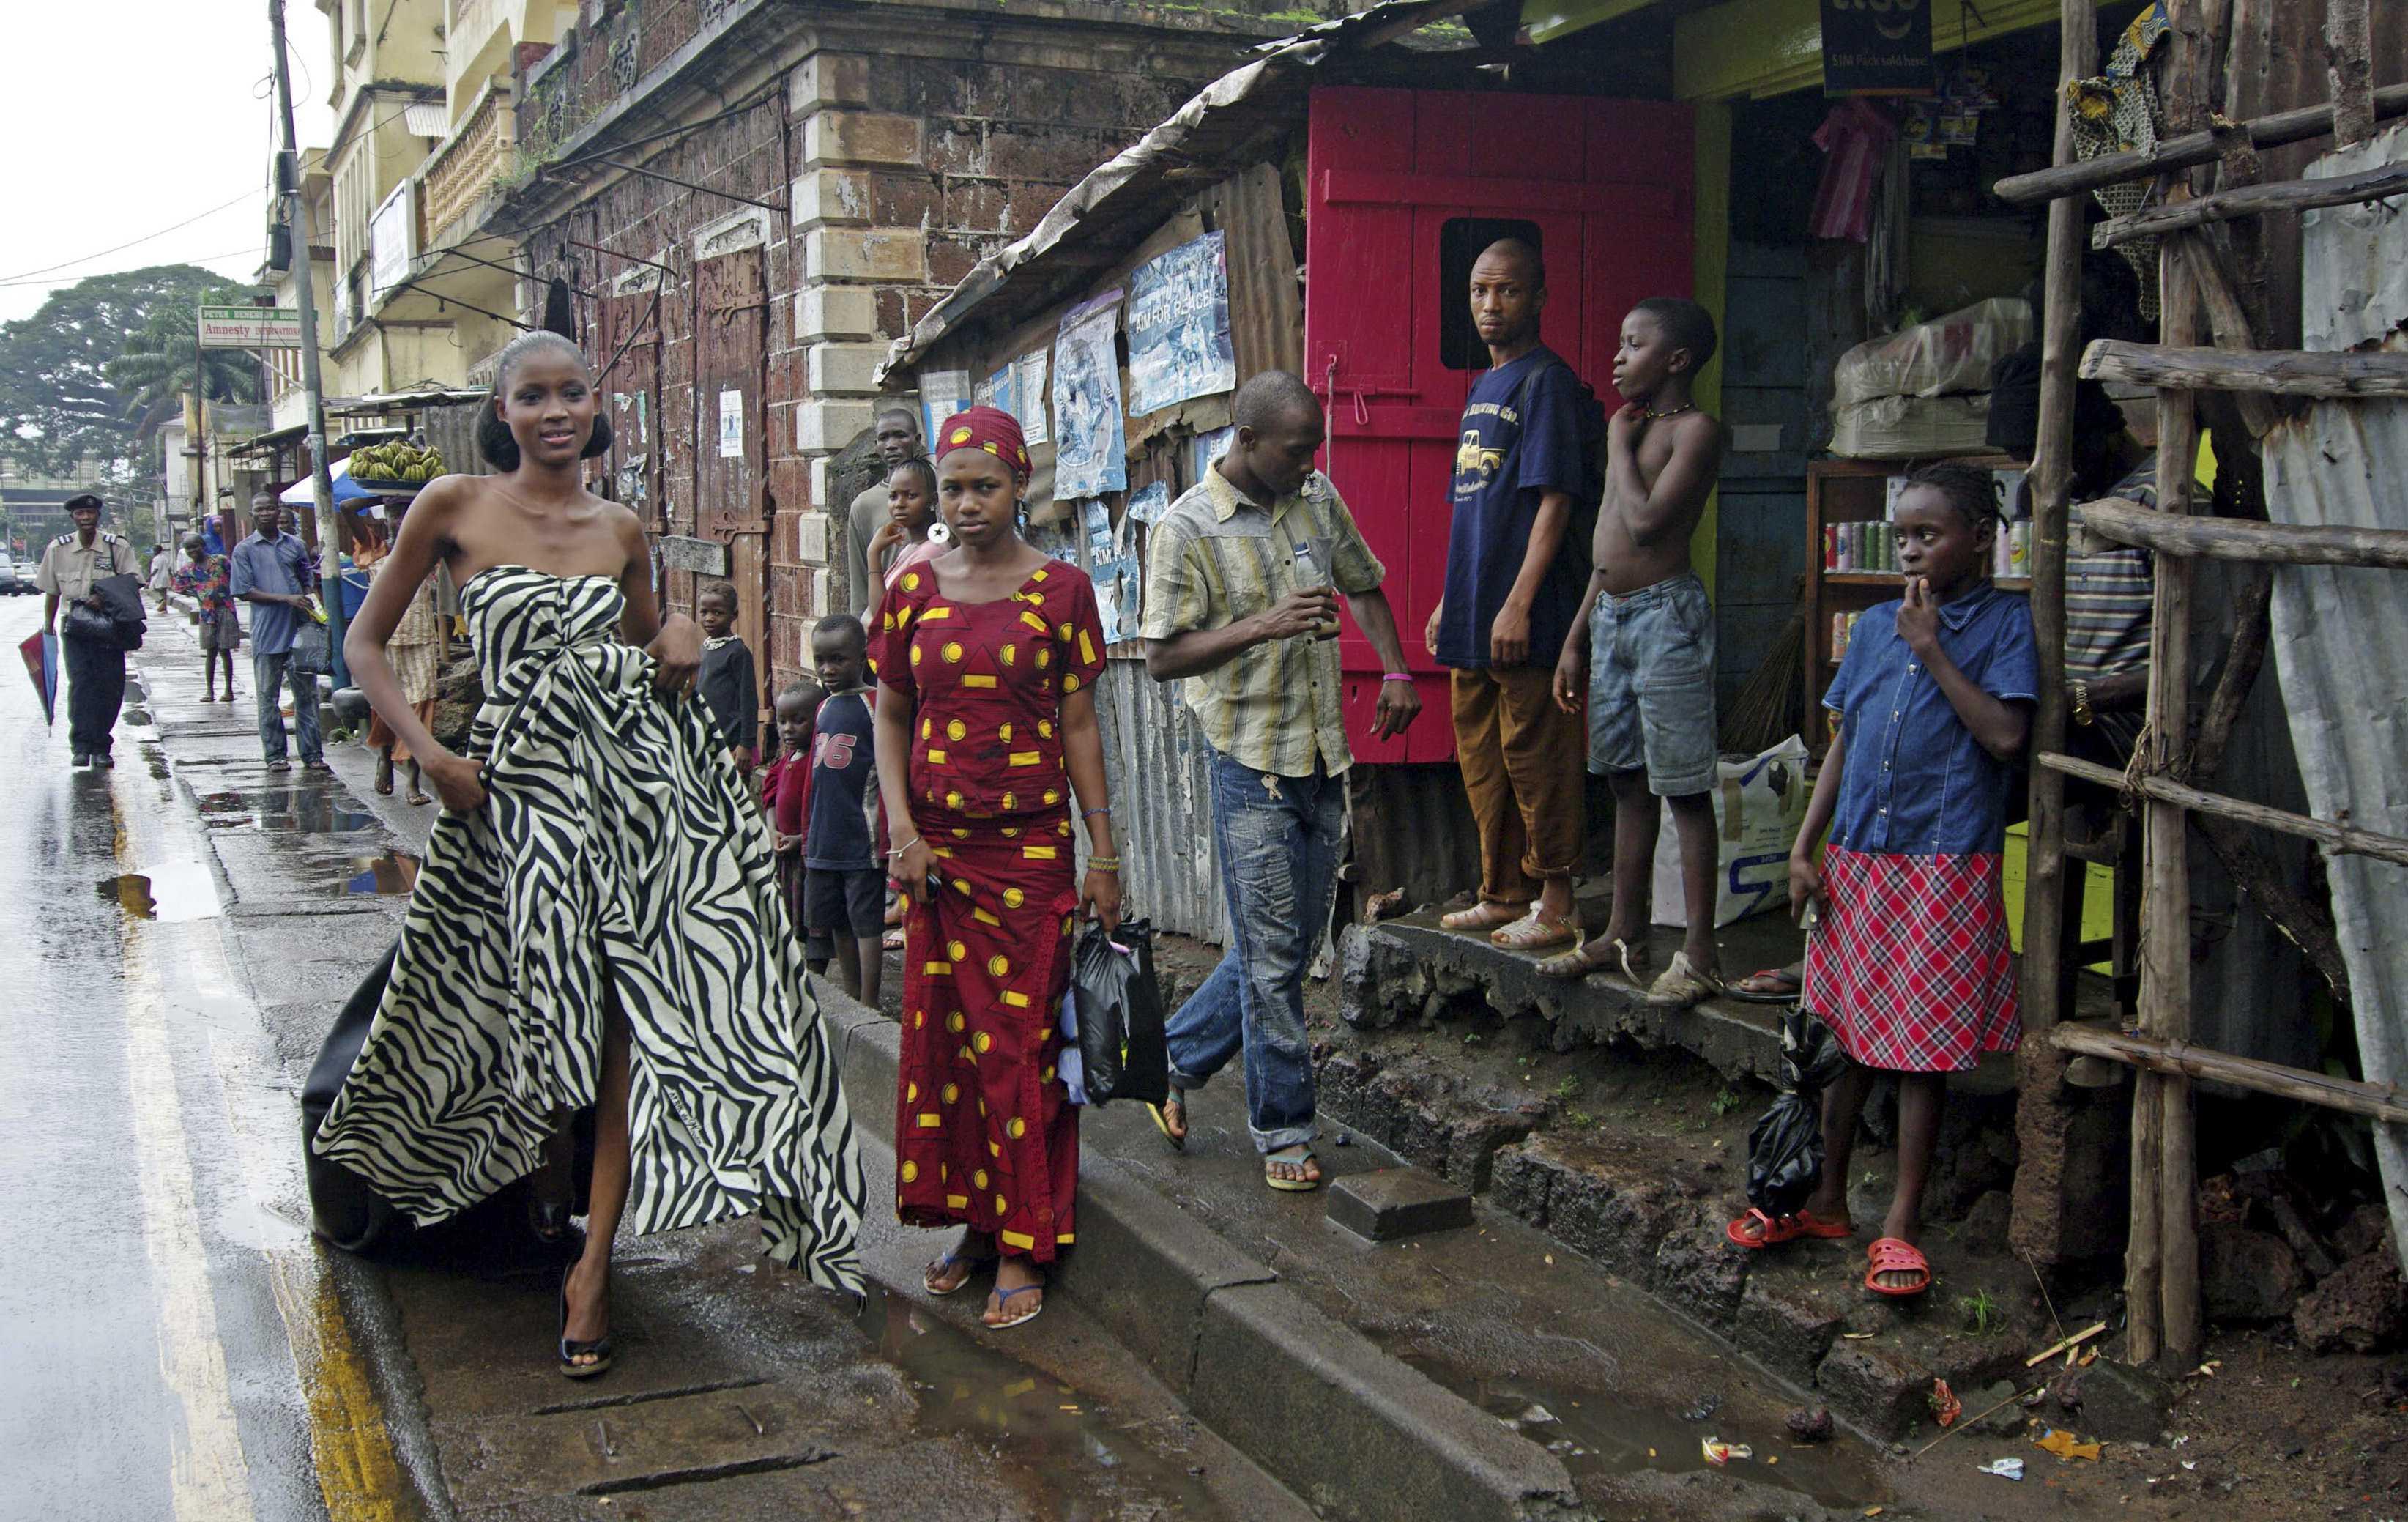 Ramatu Wurie, a Sierra Leonean beauty queen, models her first photo shoot in downtown Freetown, Sierra Leone on August 9.